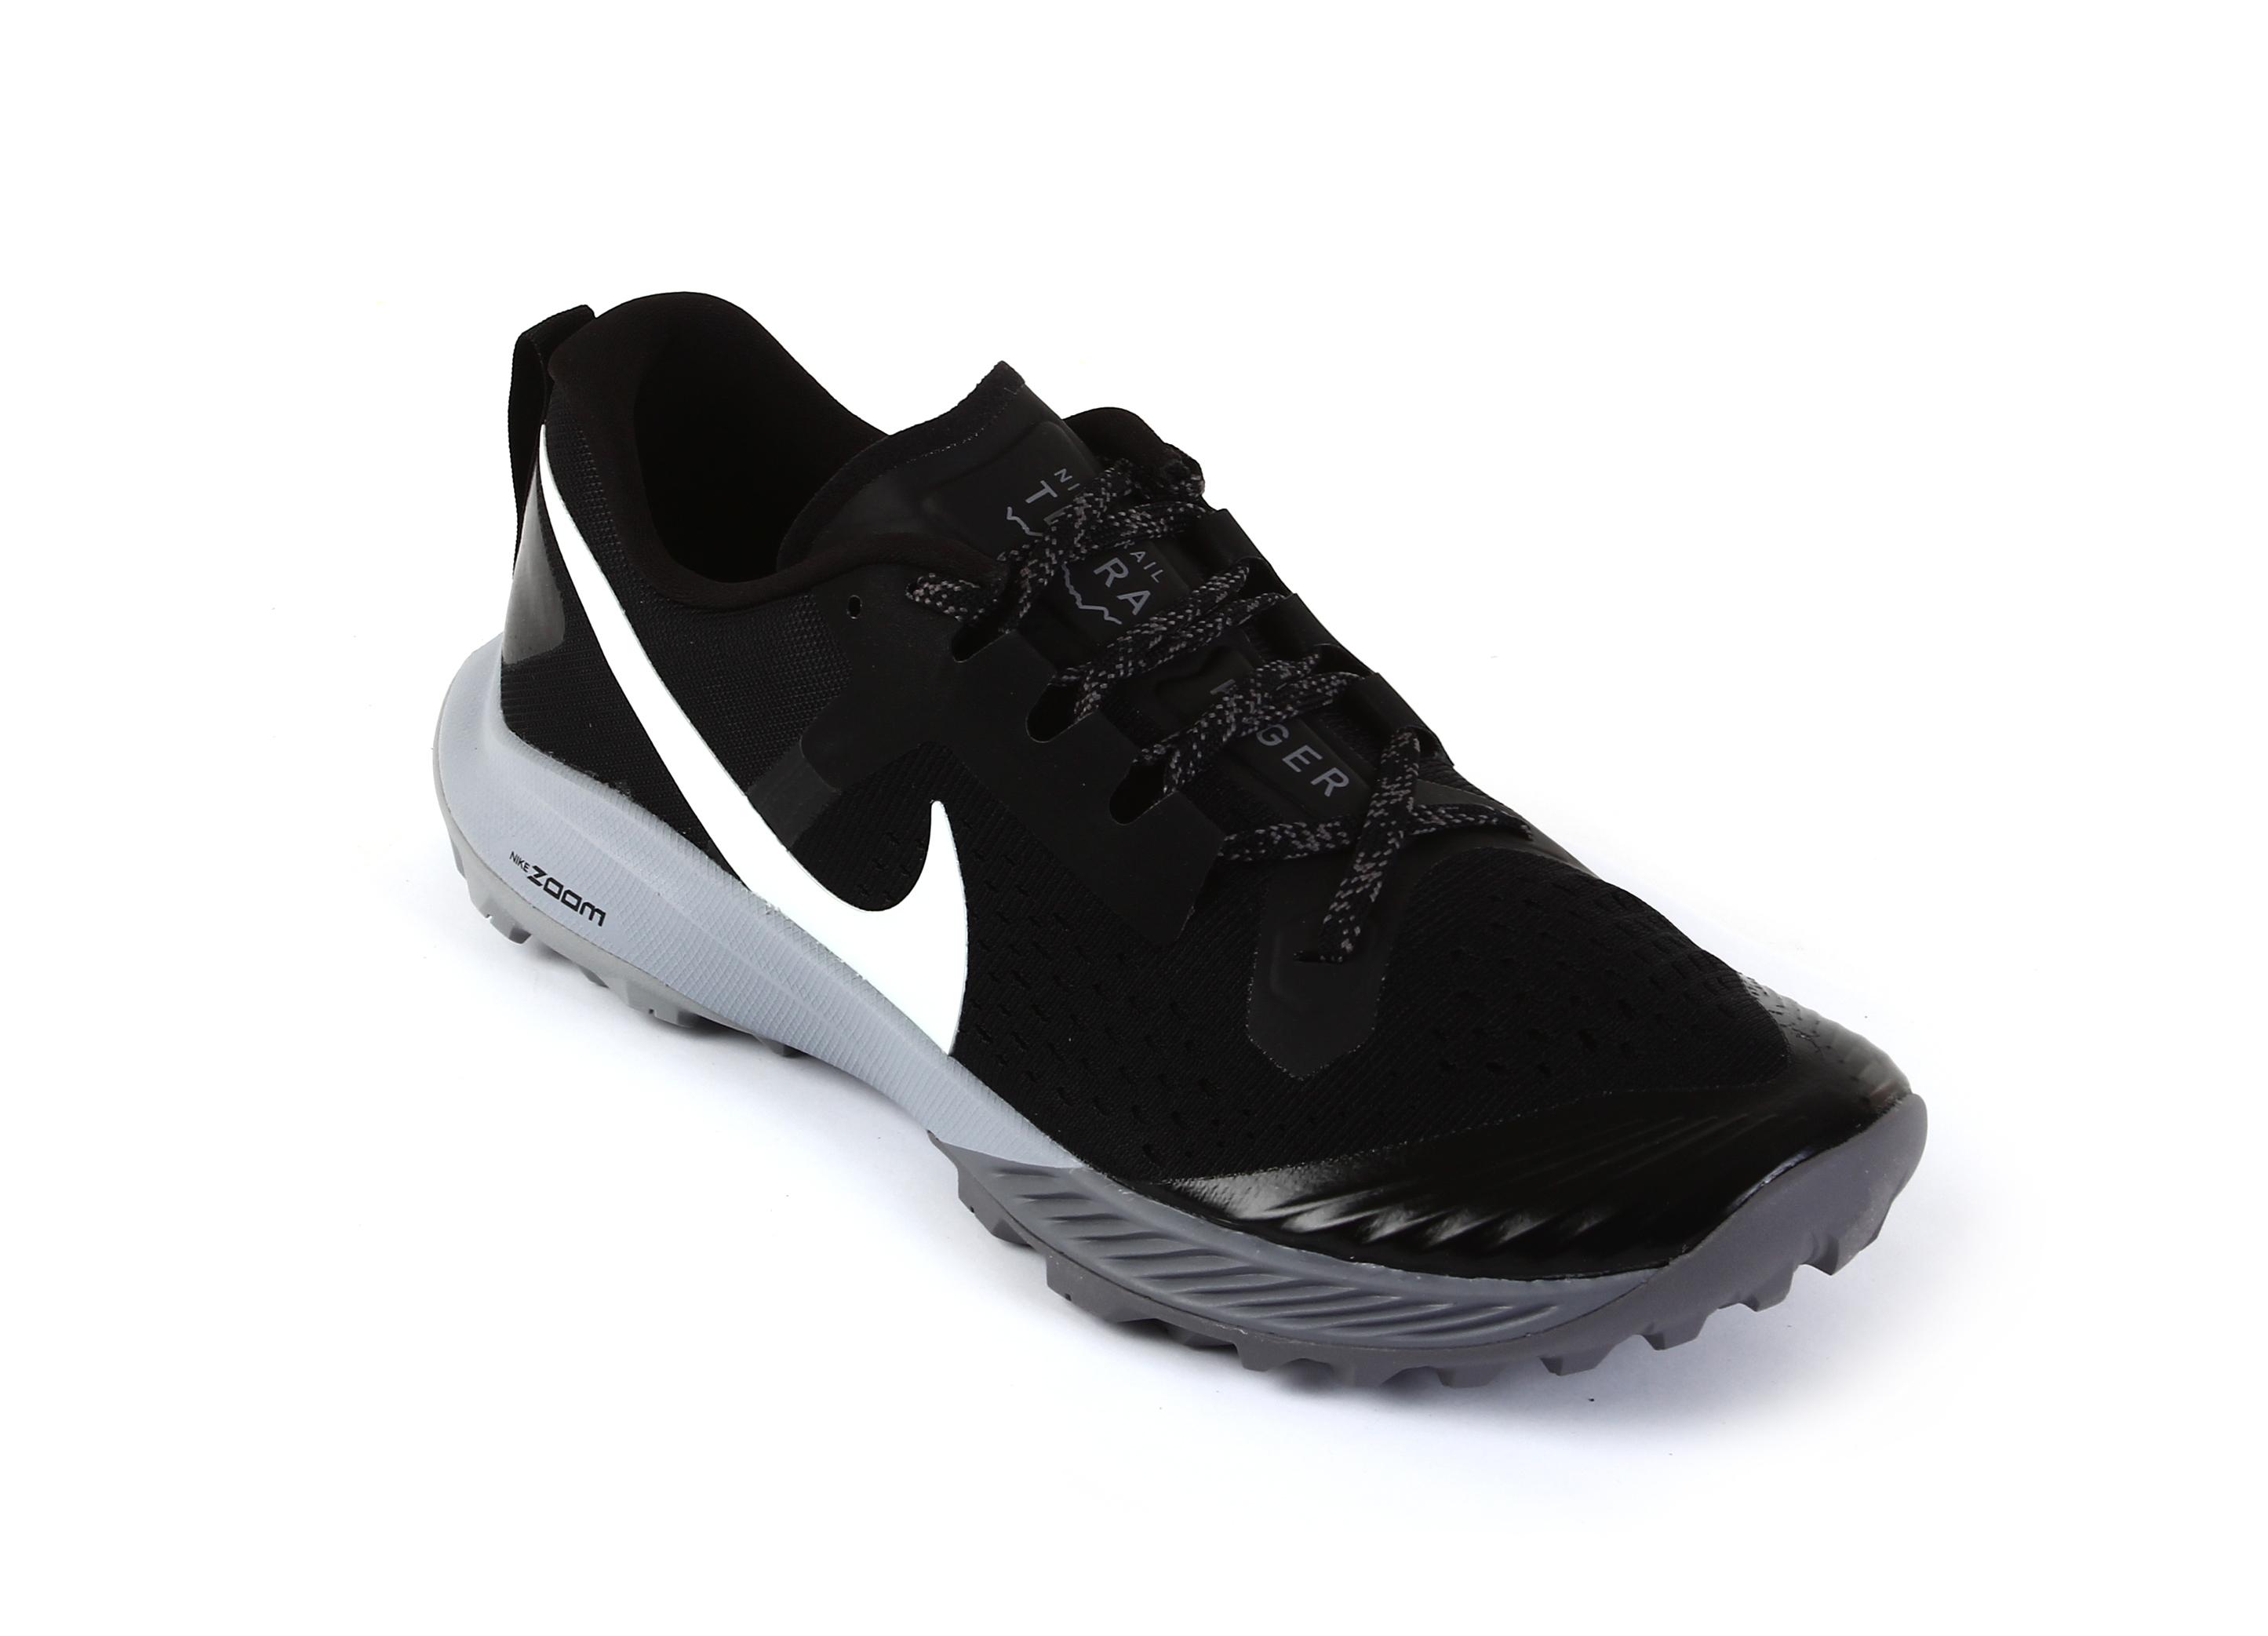 a34582c70a4fb Кроссовки мужские Nike Air Zoom Terra Kiger 5 - Сеть спортивных ...